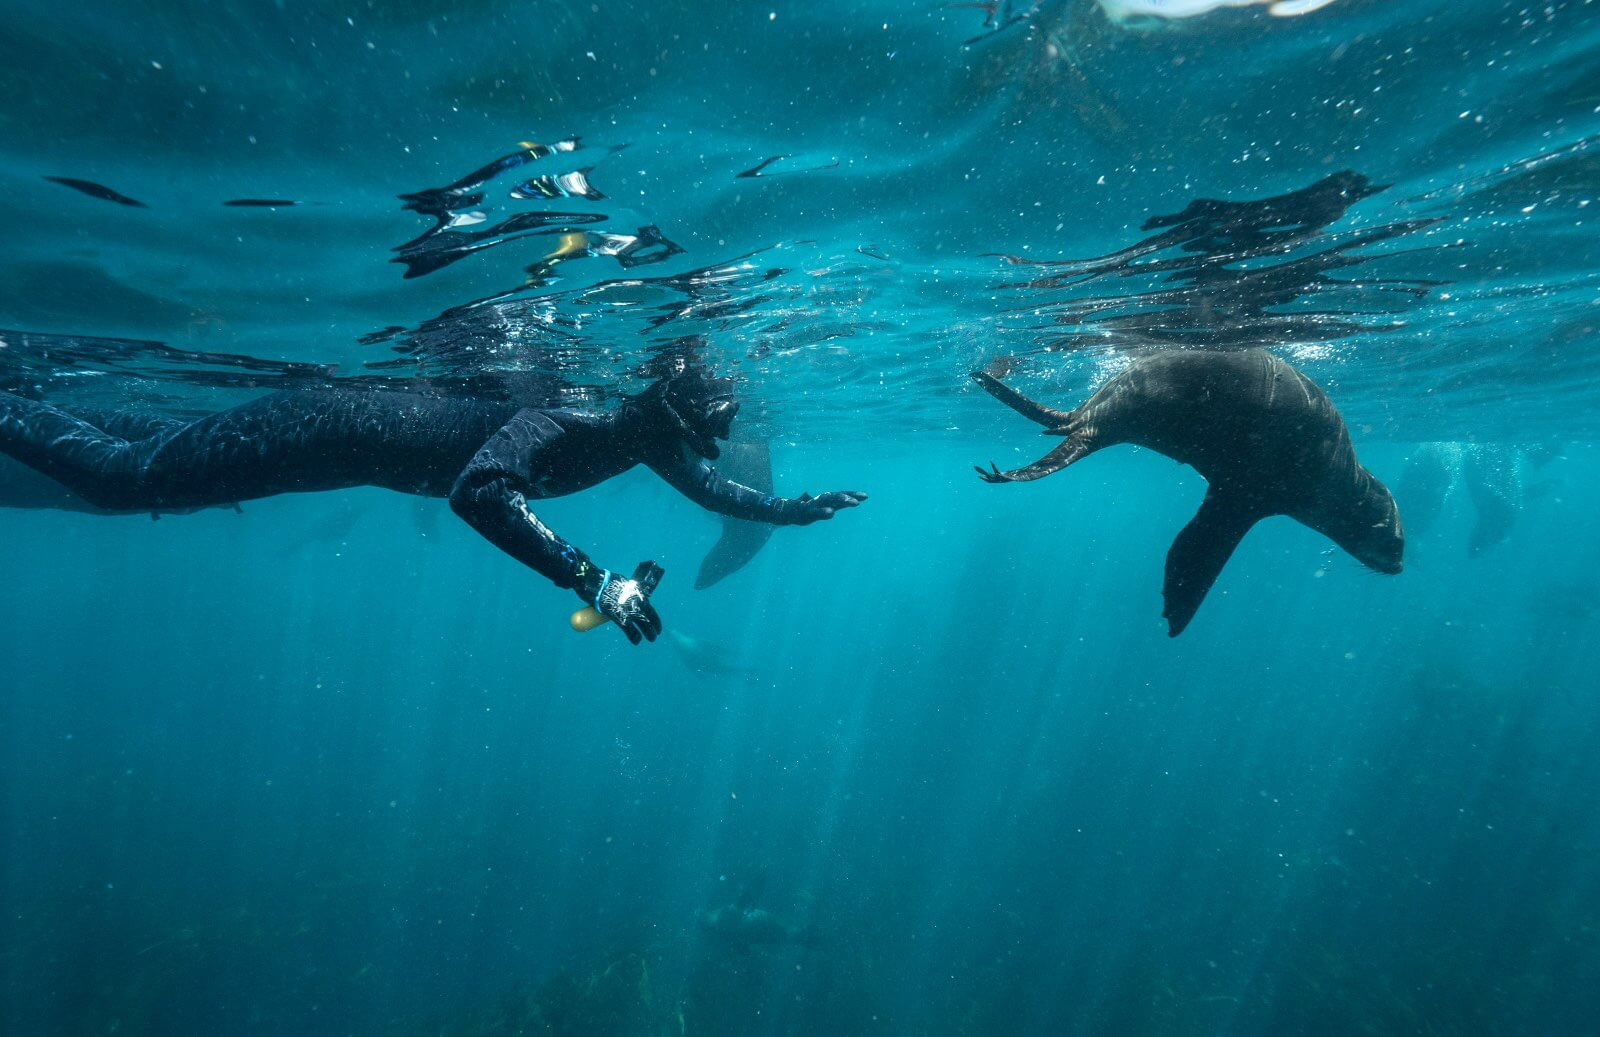 Meet the inhabitants of Seal Island